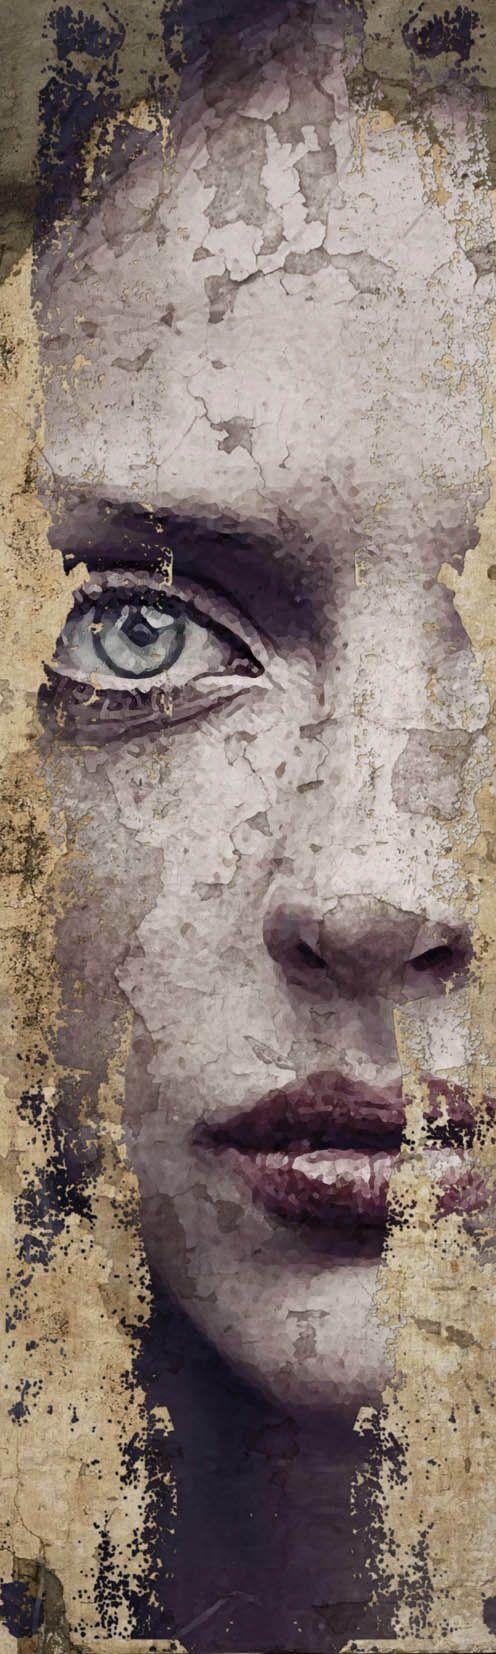 ANTONIO MORA superposition of photographs by Spanis painter ANTONIO MORA